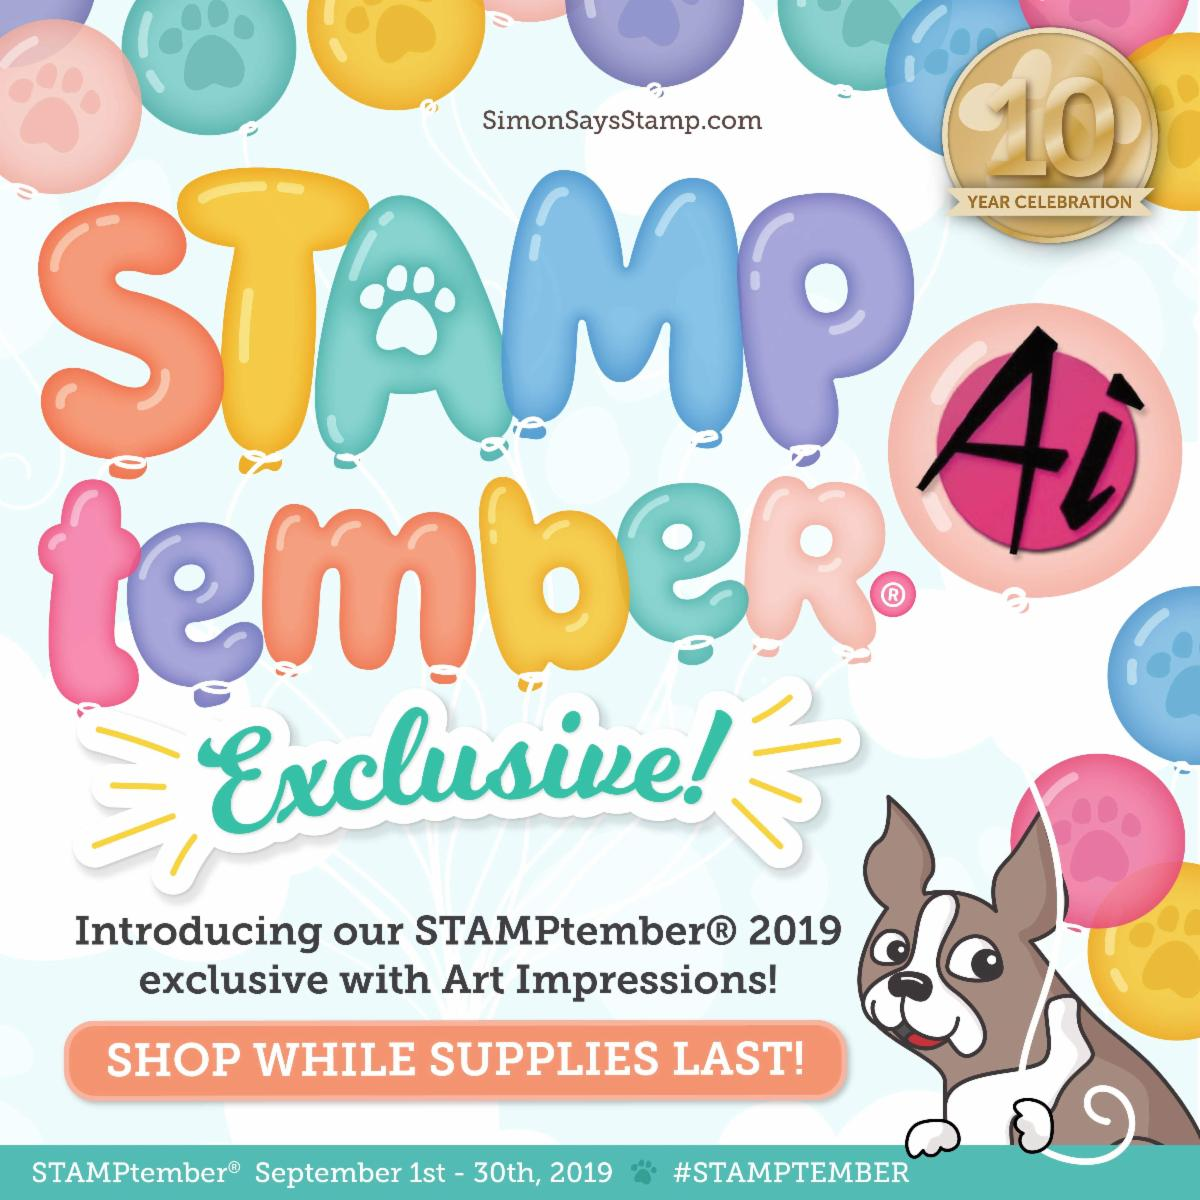 Stamptember